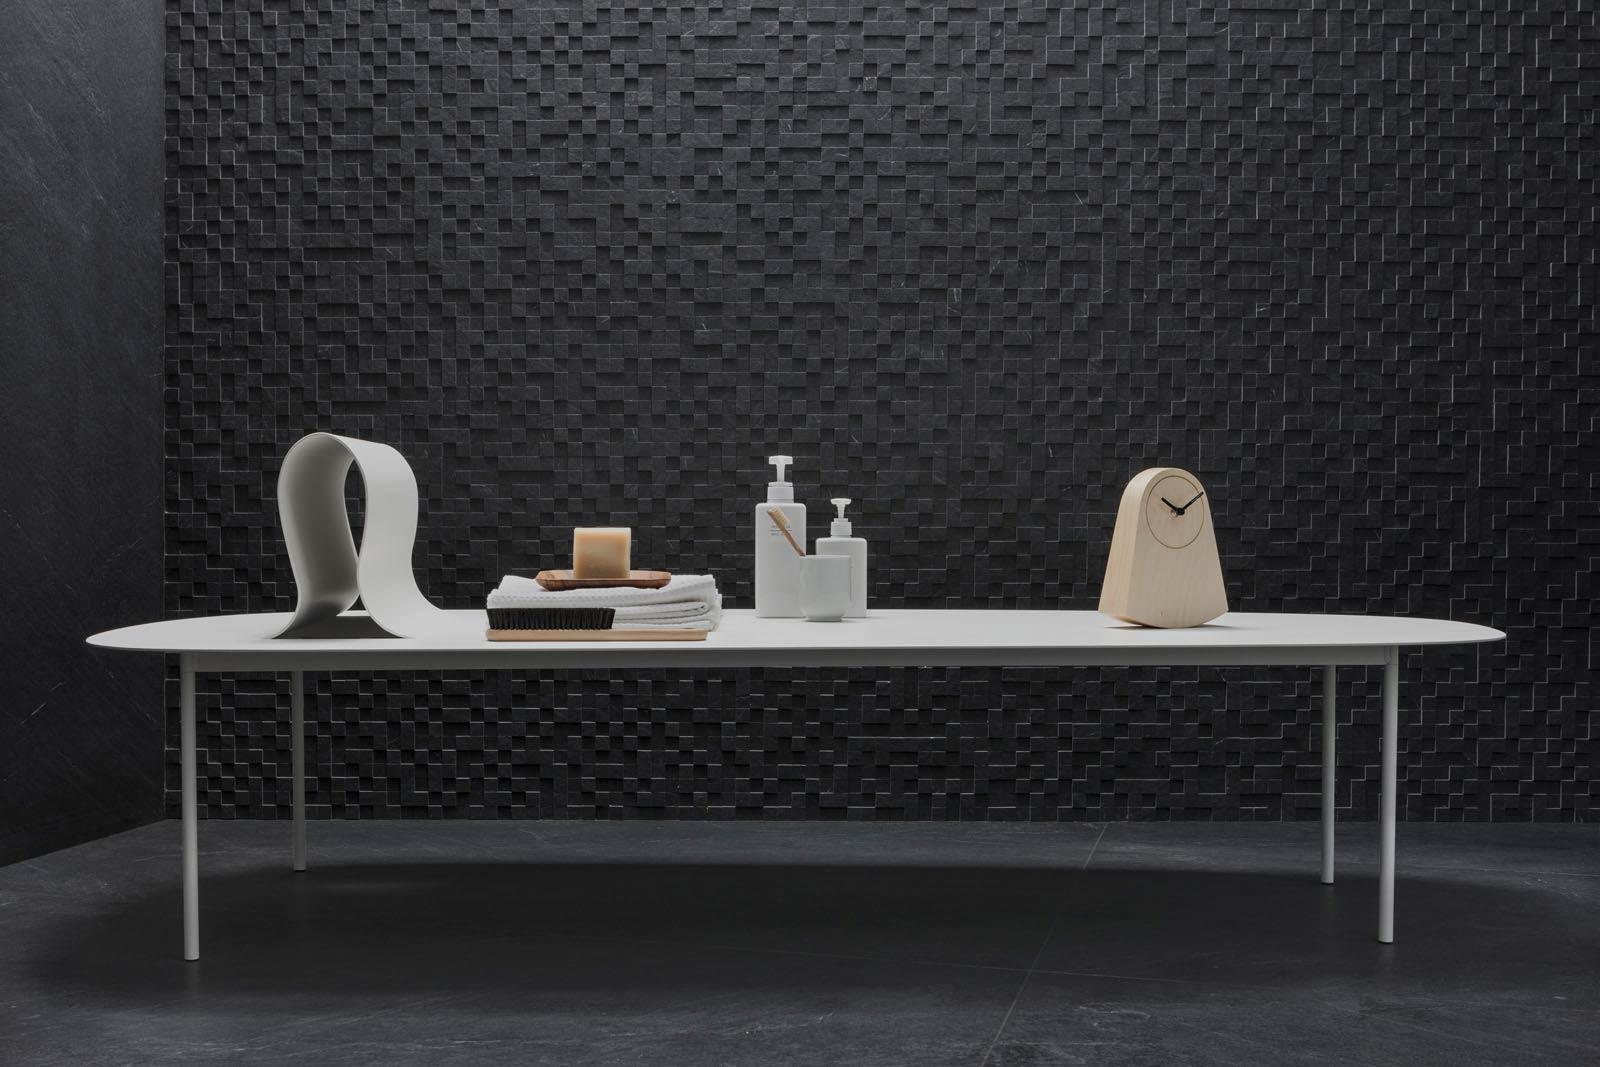 skandinavische badezimmer | marazzi, Badezimmer ideen